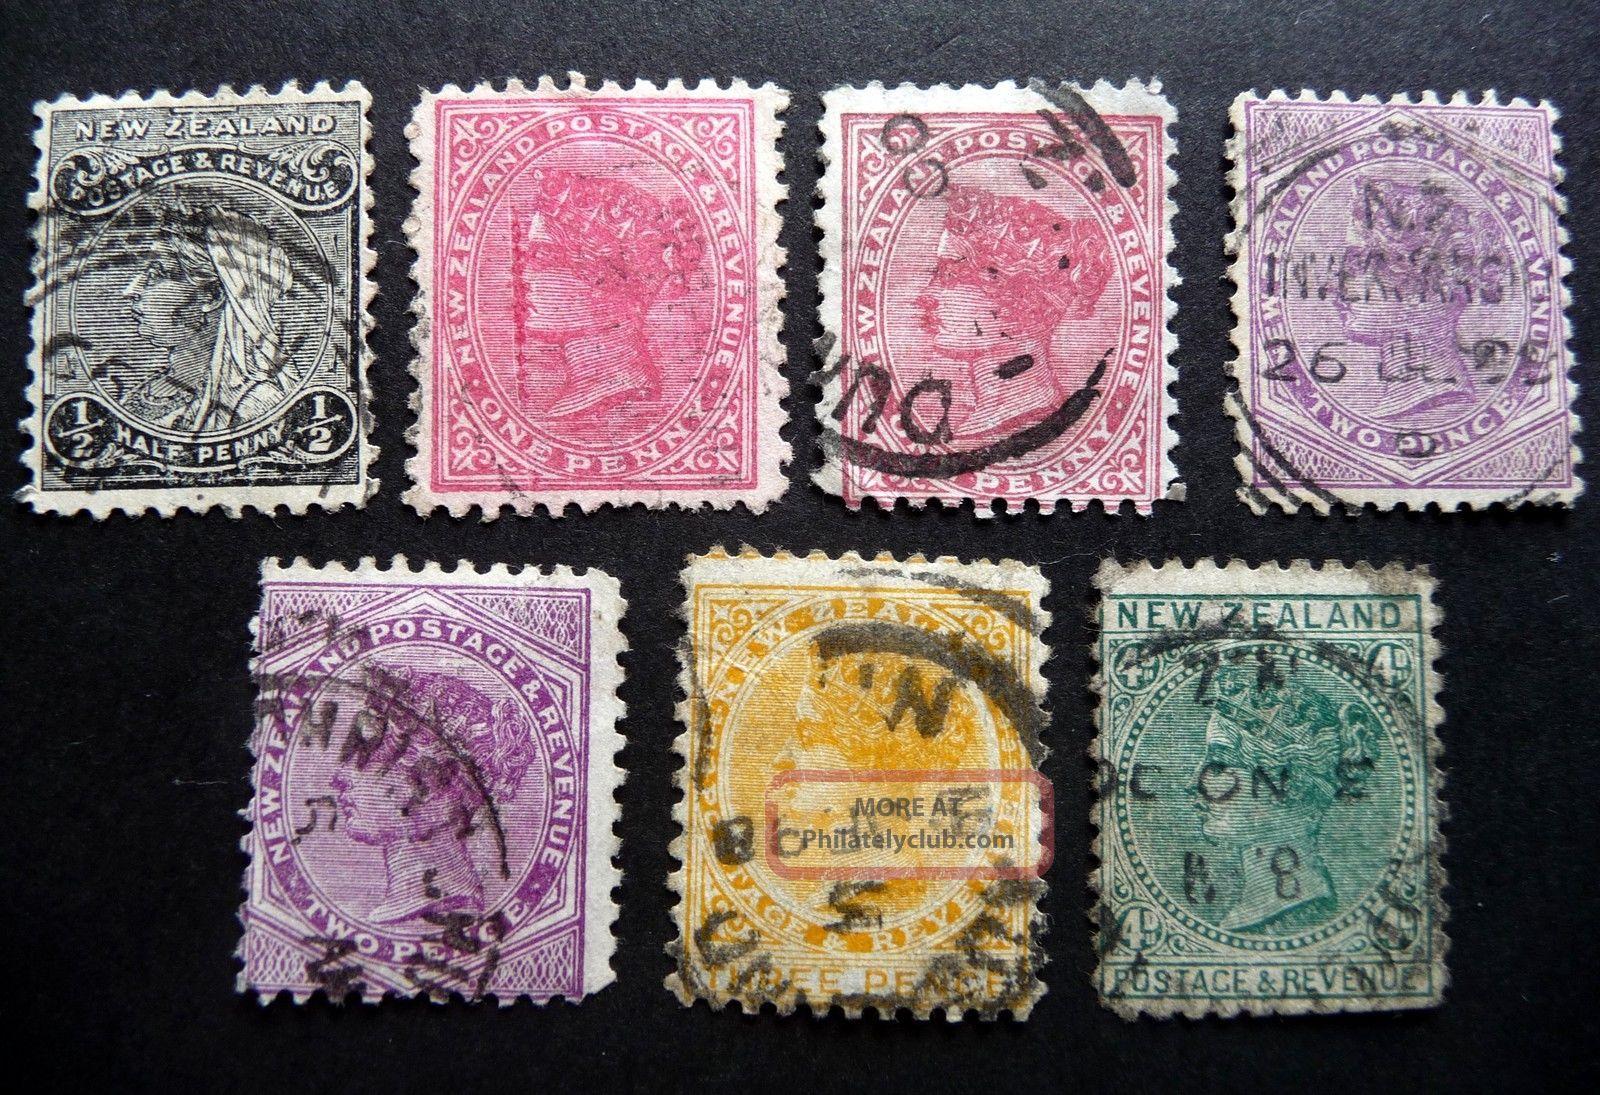 N Z Qvic 1895 - 1900 Definitives Perf 11 Sg236 - 8/40 - 1? As Seen Australia & Oceania photo